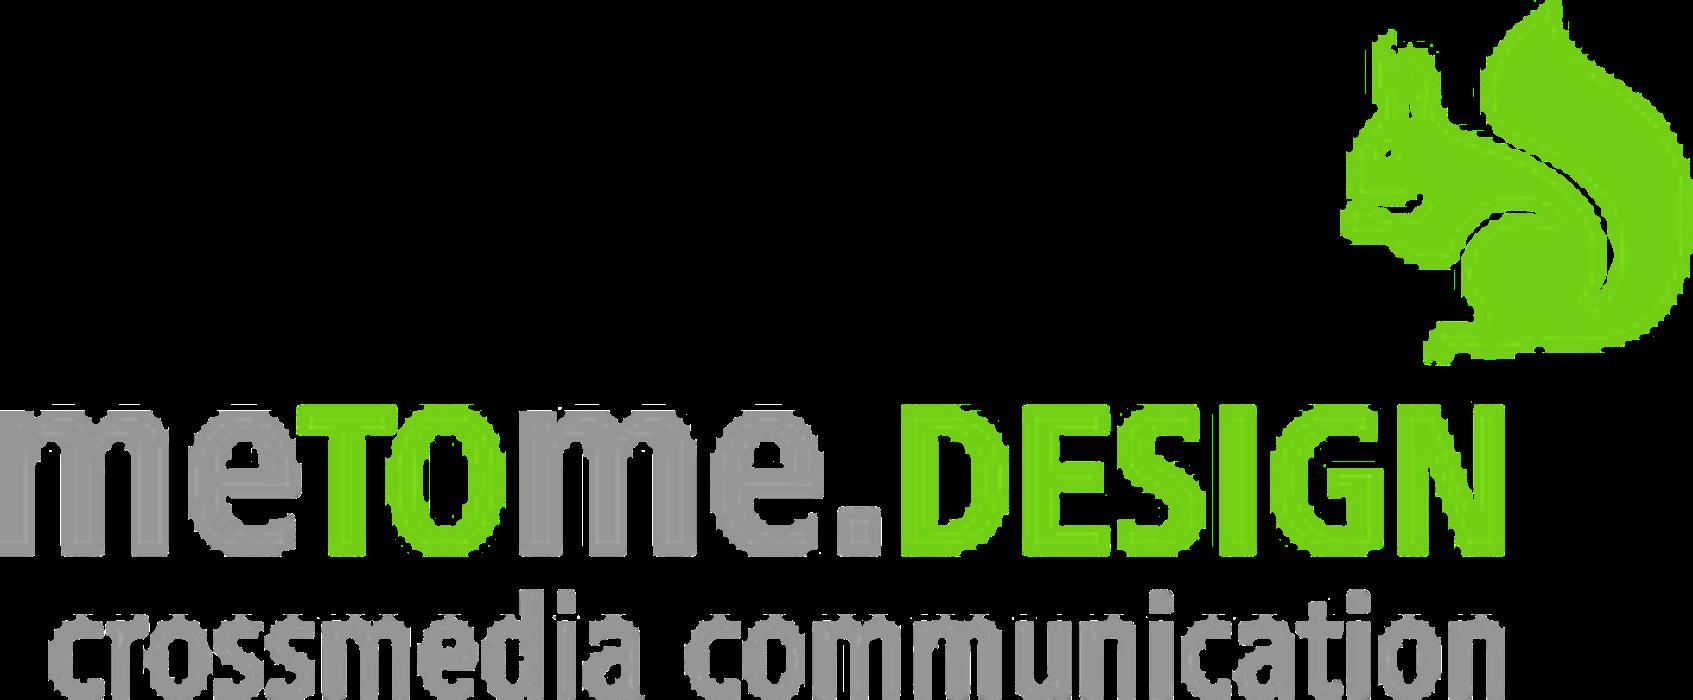 metome.design GmbH in Berlin